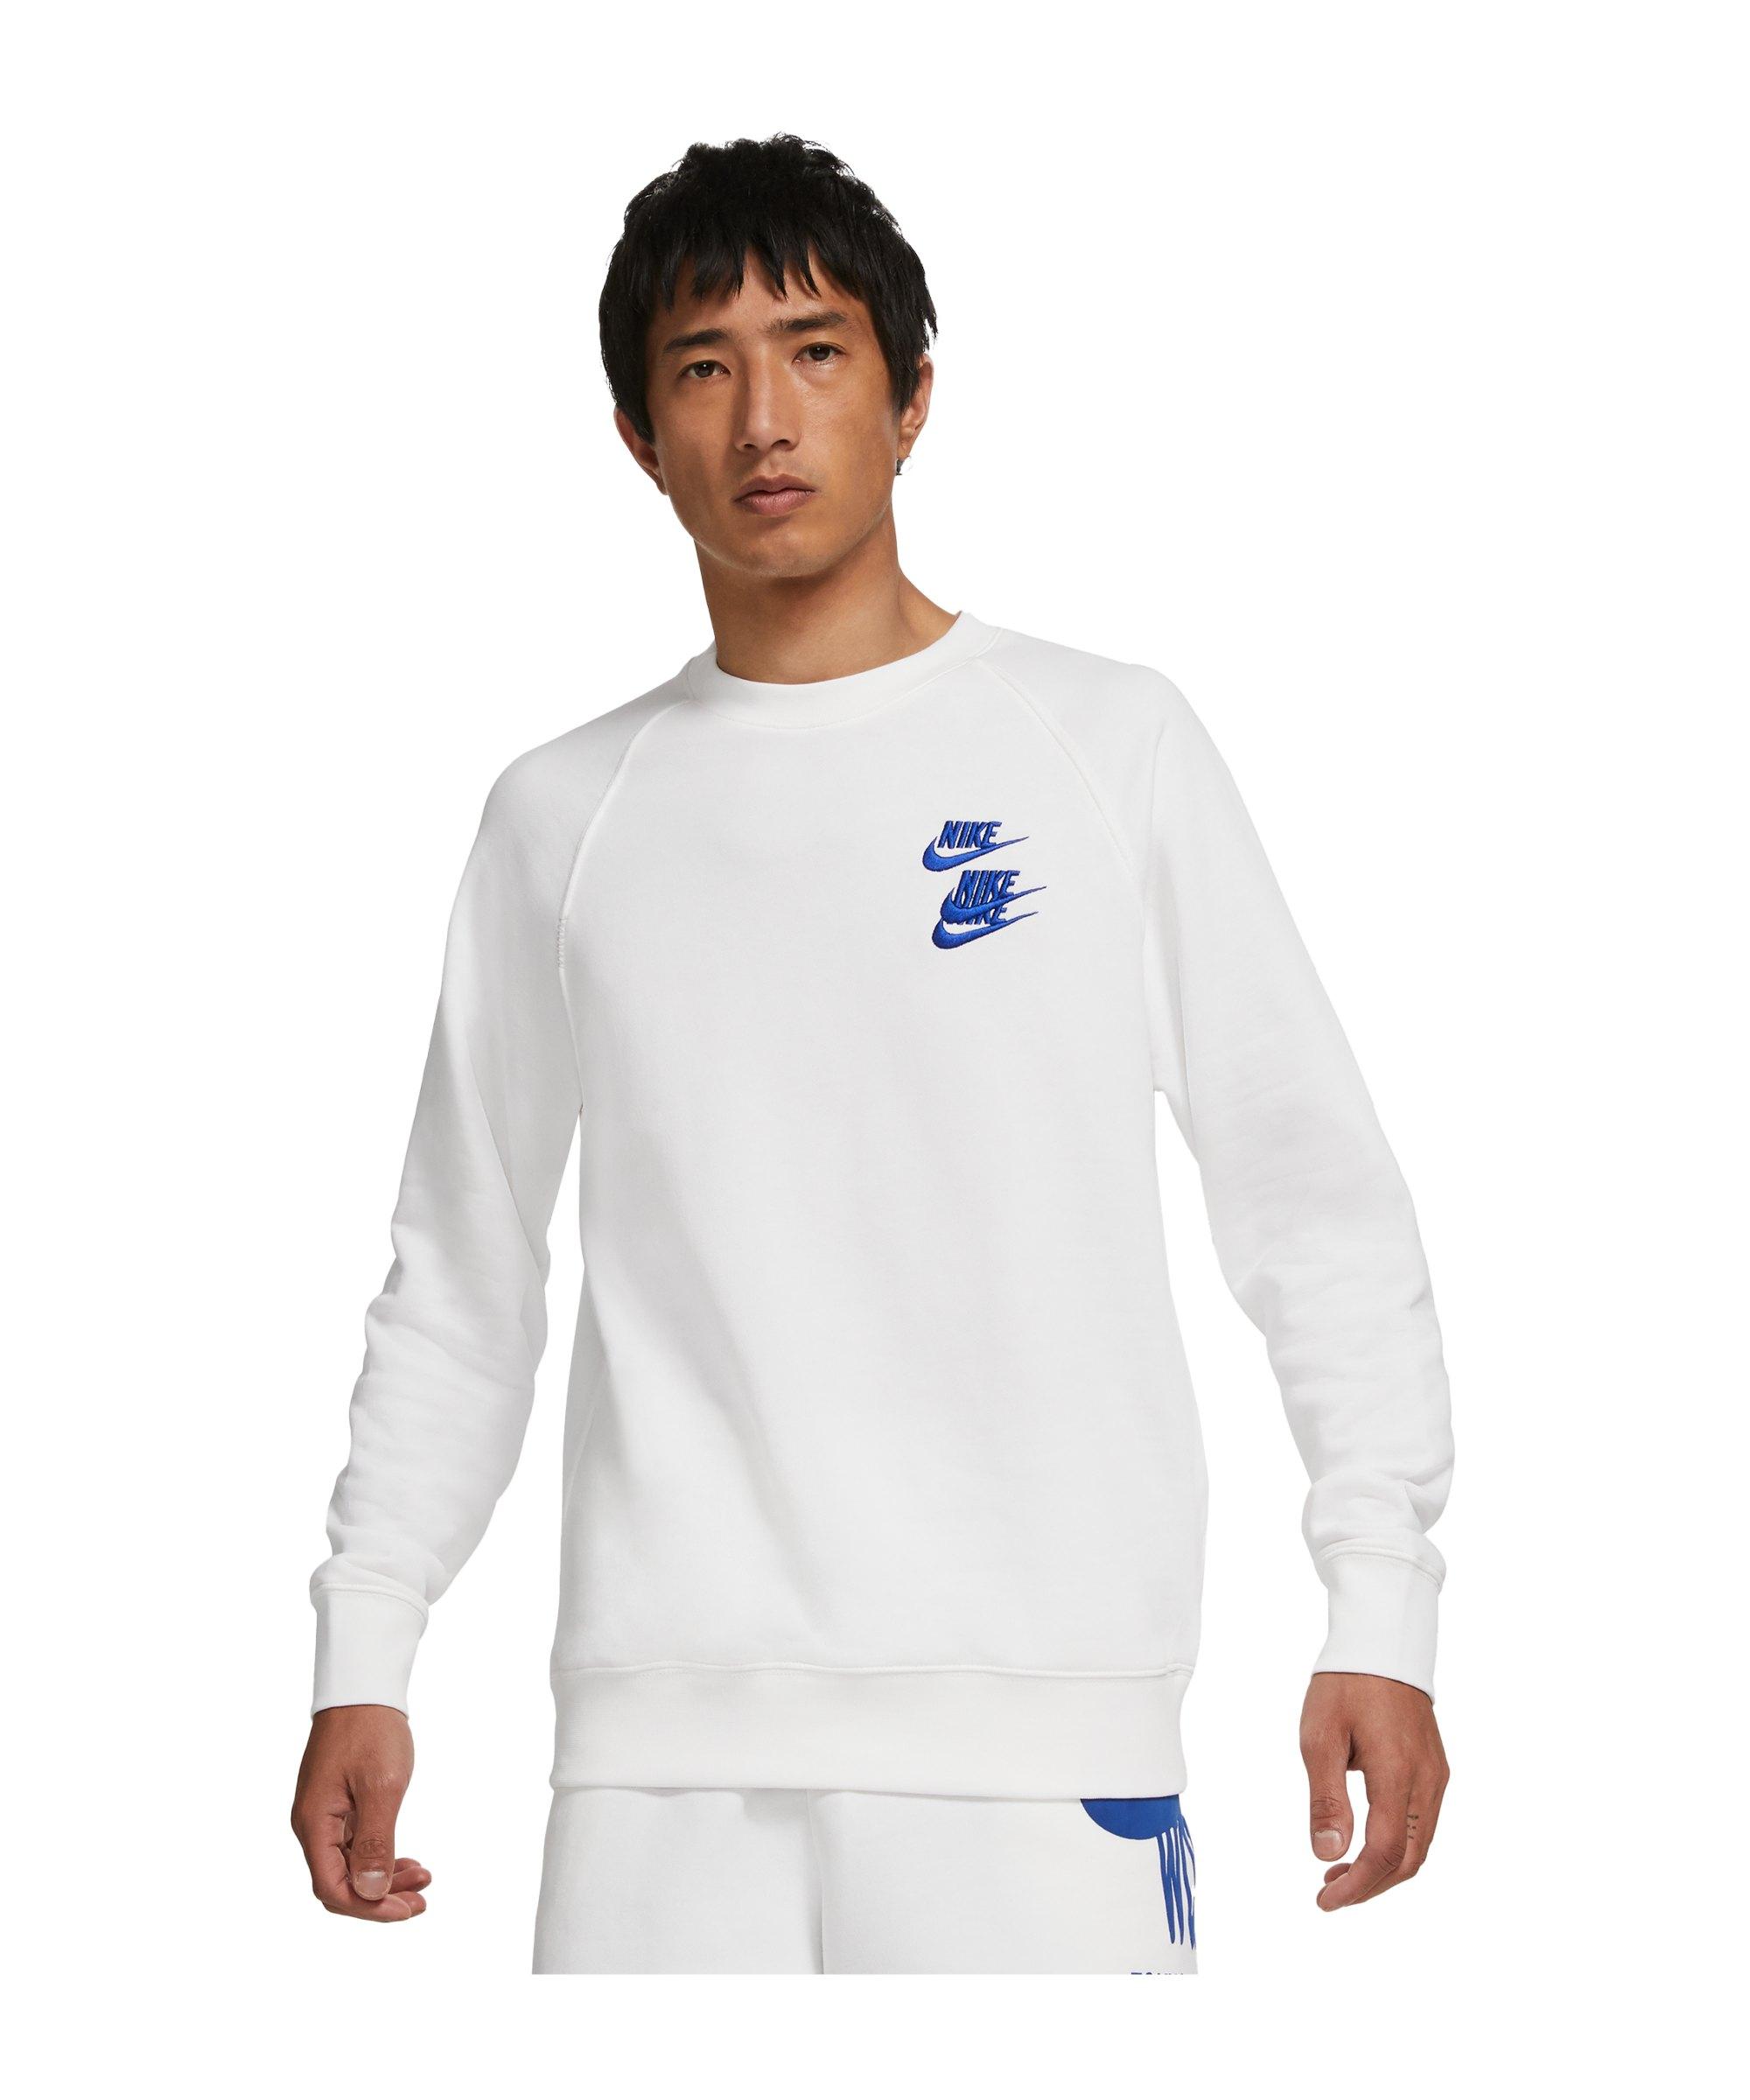 Nike World Tour Crew Sweatshirt Weiss F100 - weiss